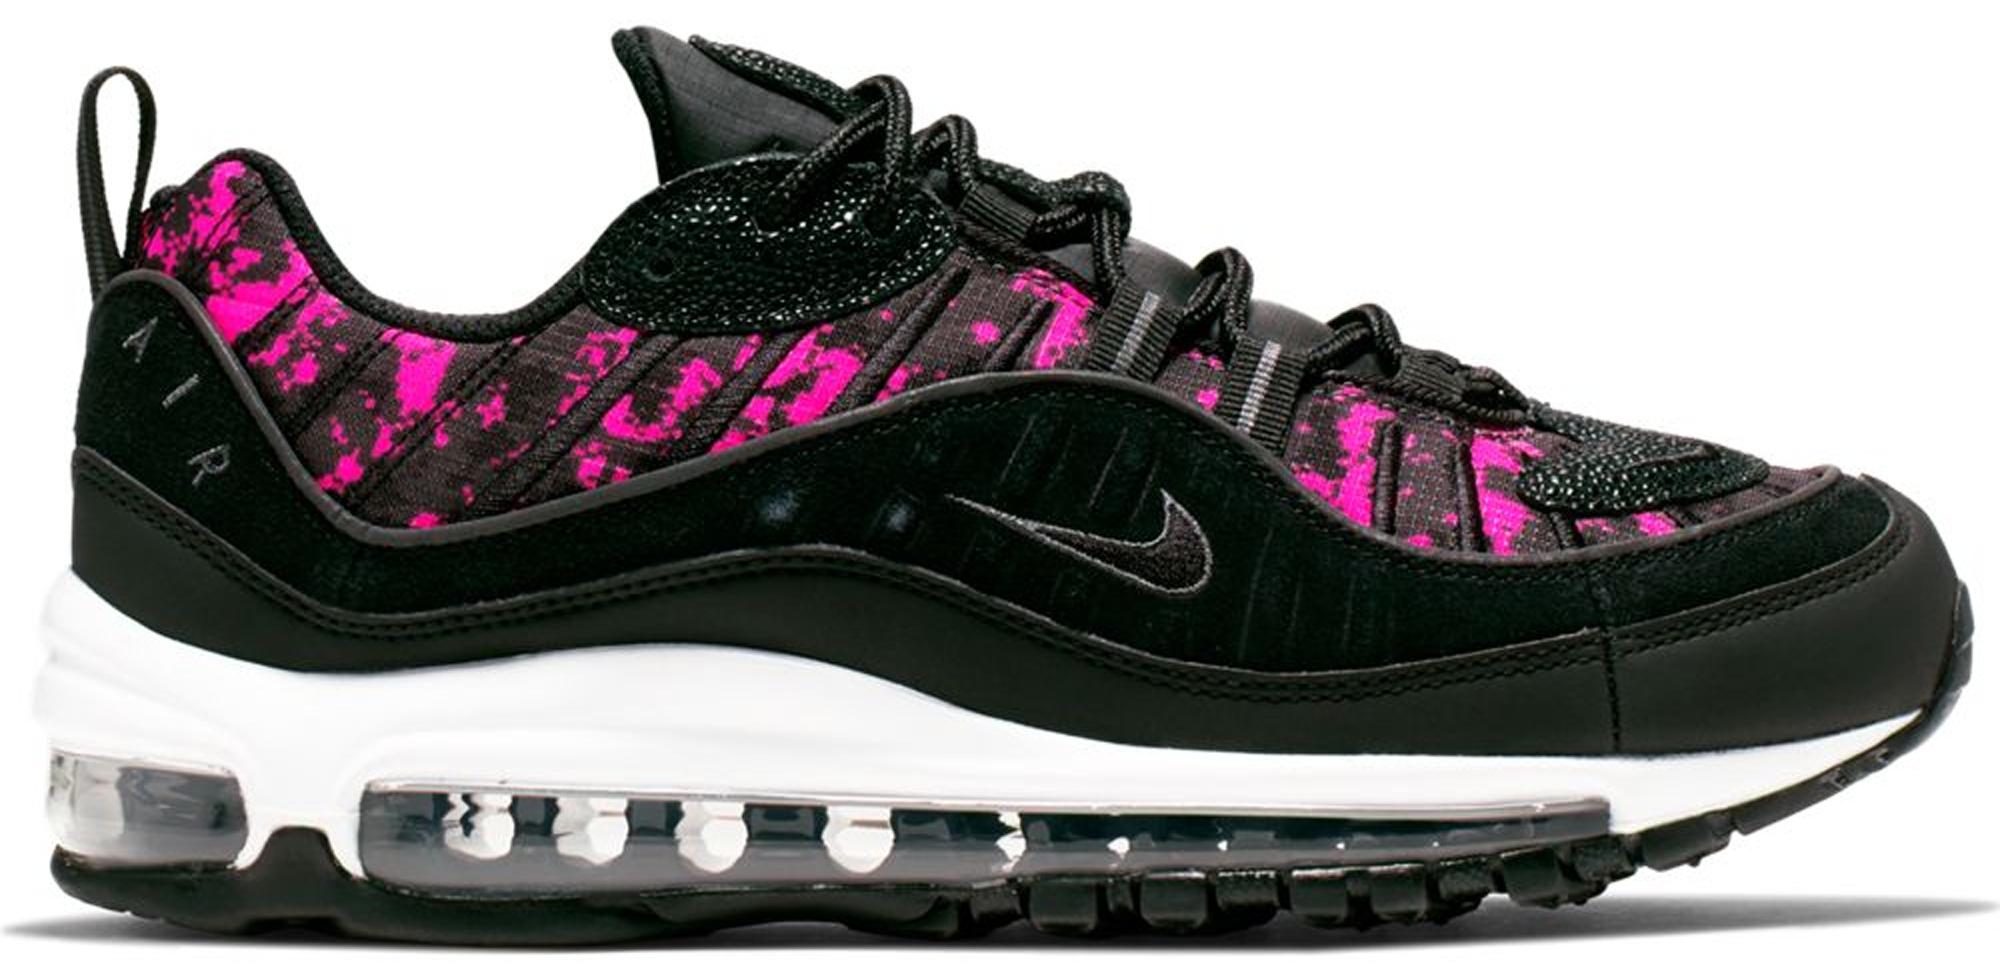 Nike Air Max 98 Pixel Black Hyper Pink